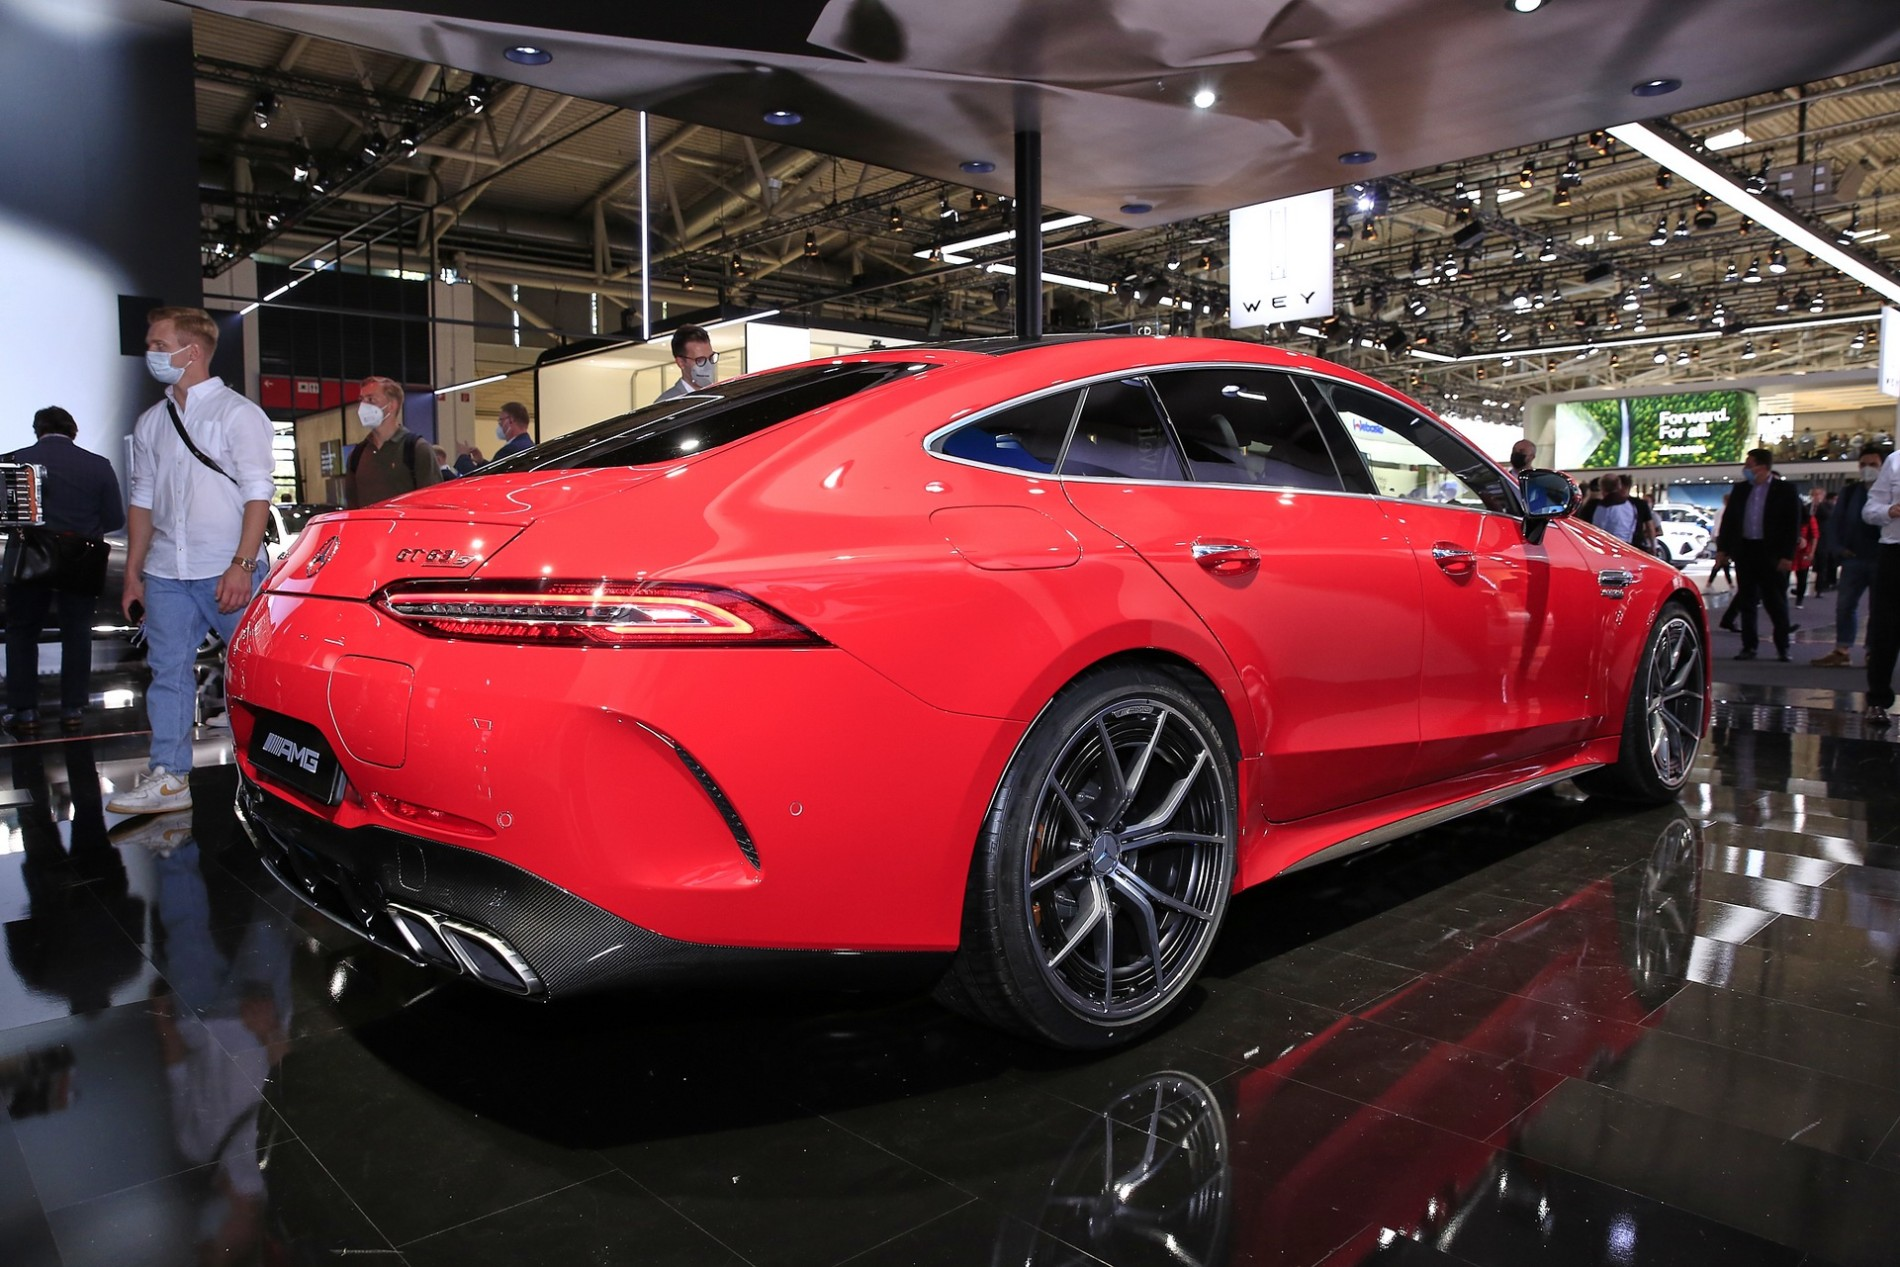 Mercedes-AMG GT 63 S E Performance - Poze reale - Mercedes-AMG GT 63 S E Performance - Poze reale